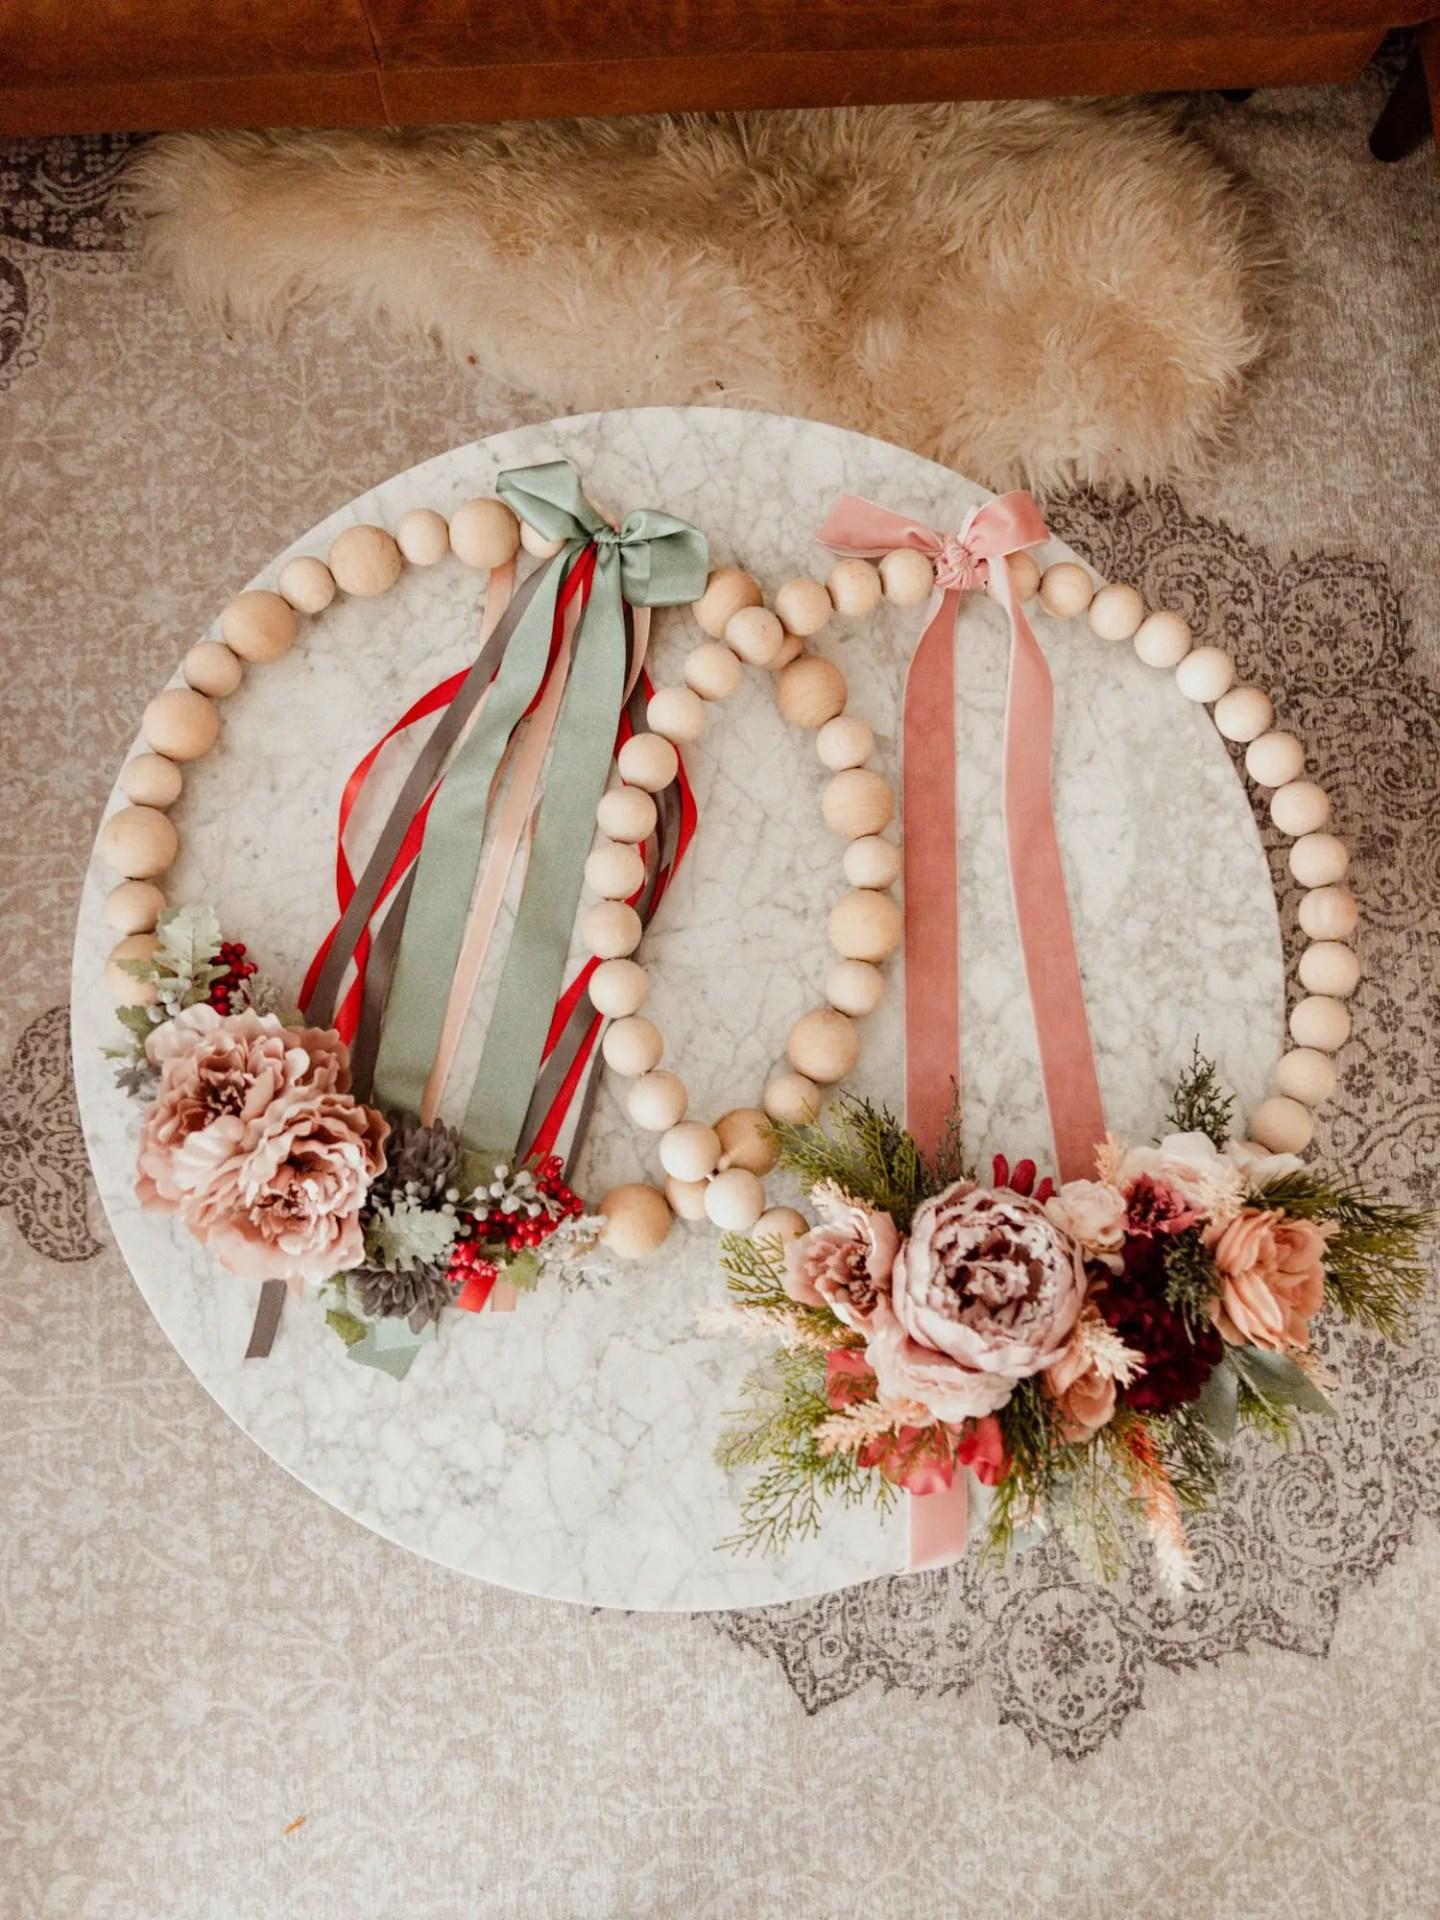 Easy DIY Wooden Bead Christmas Wreath